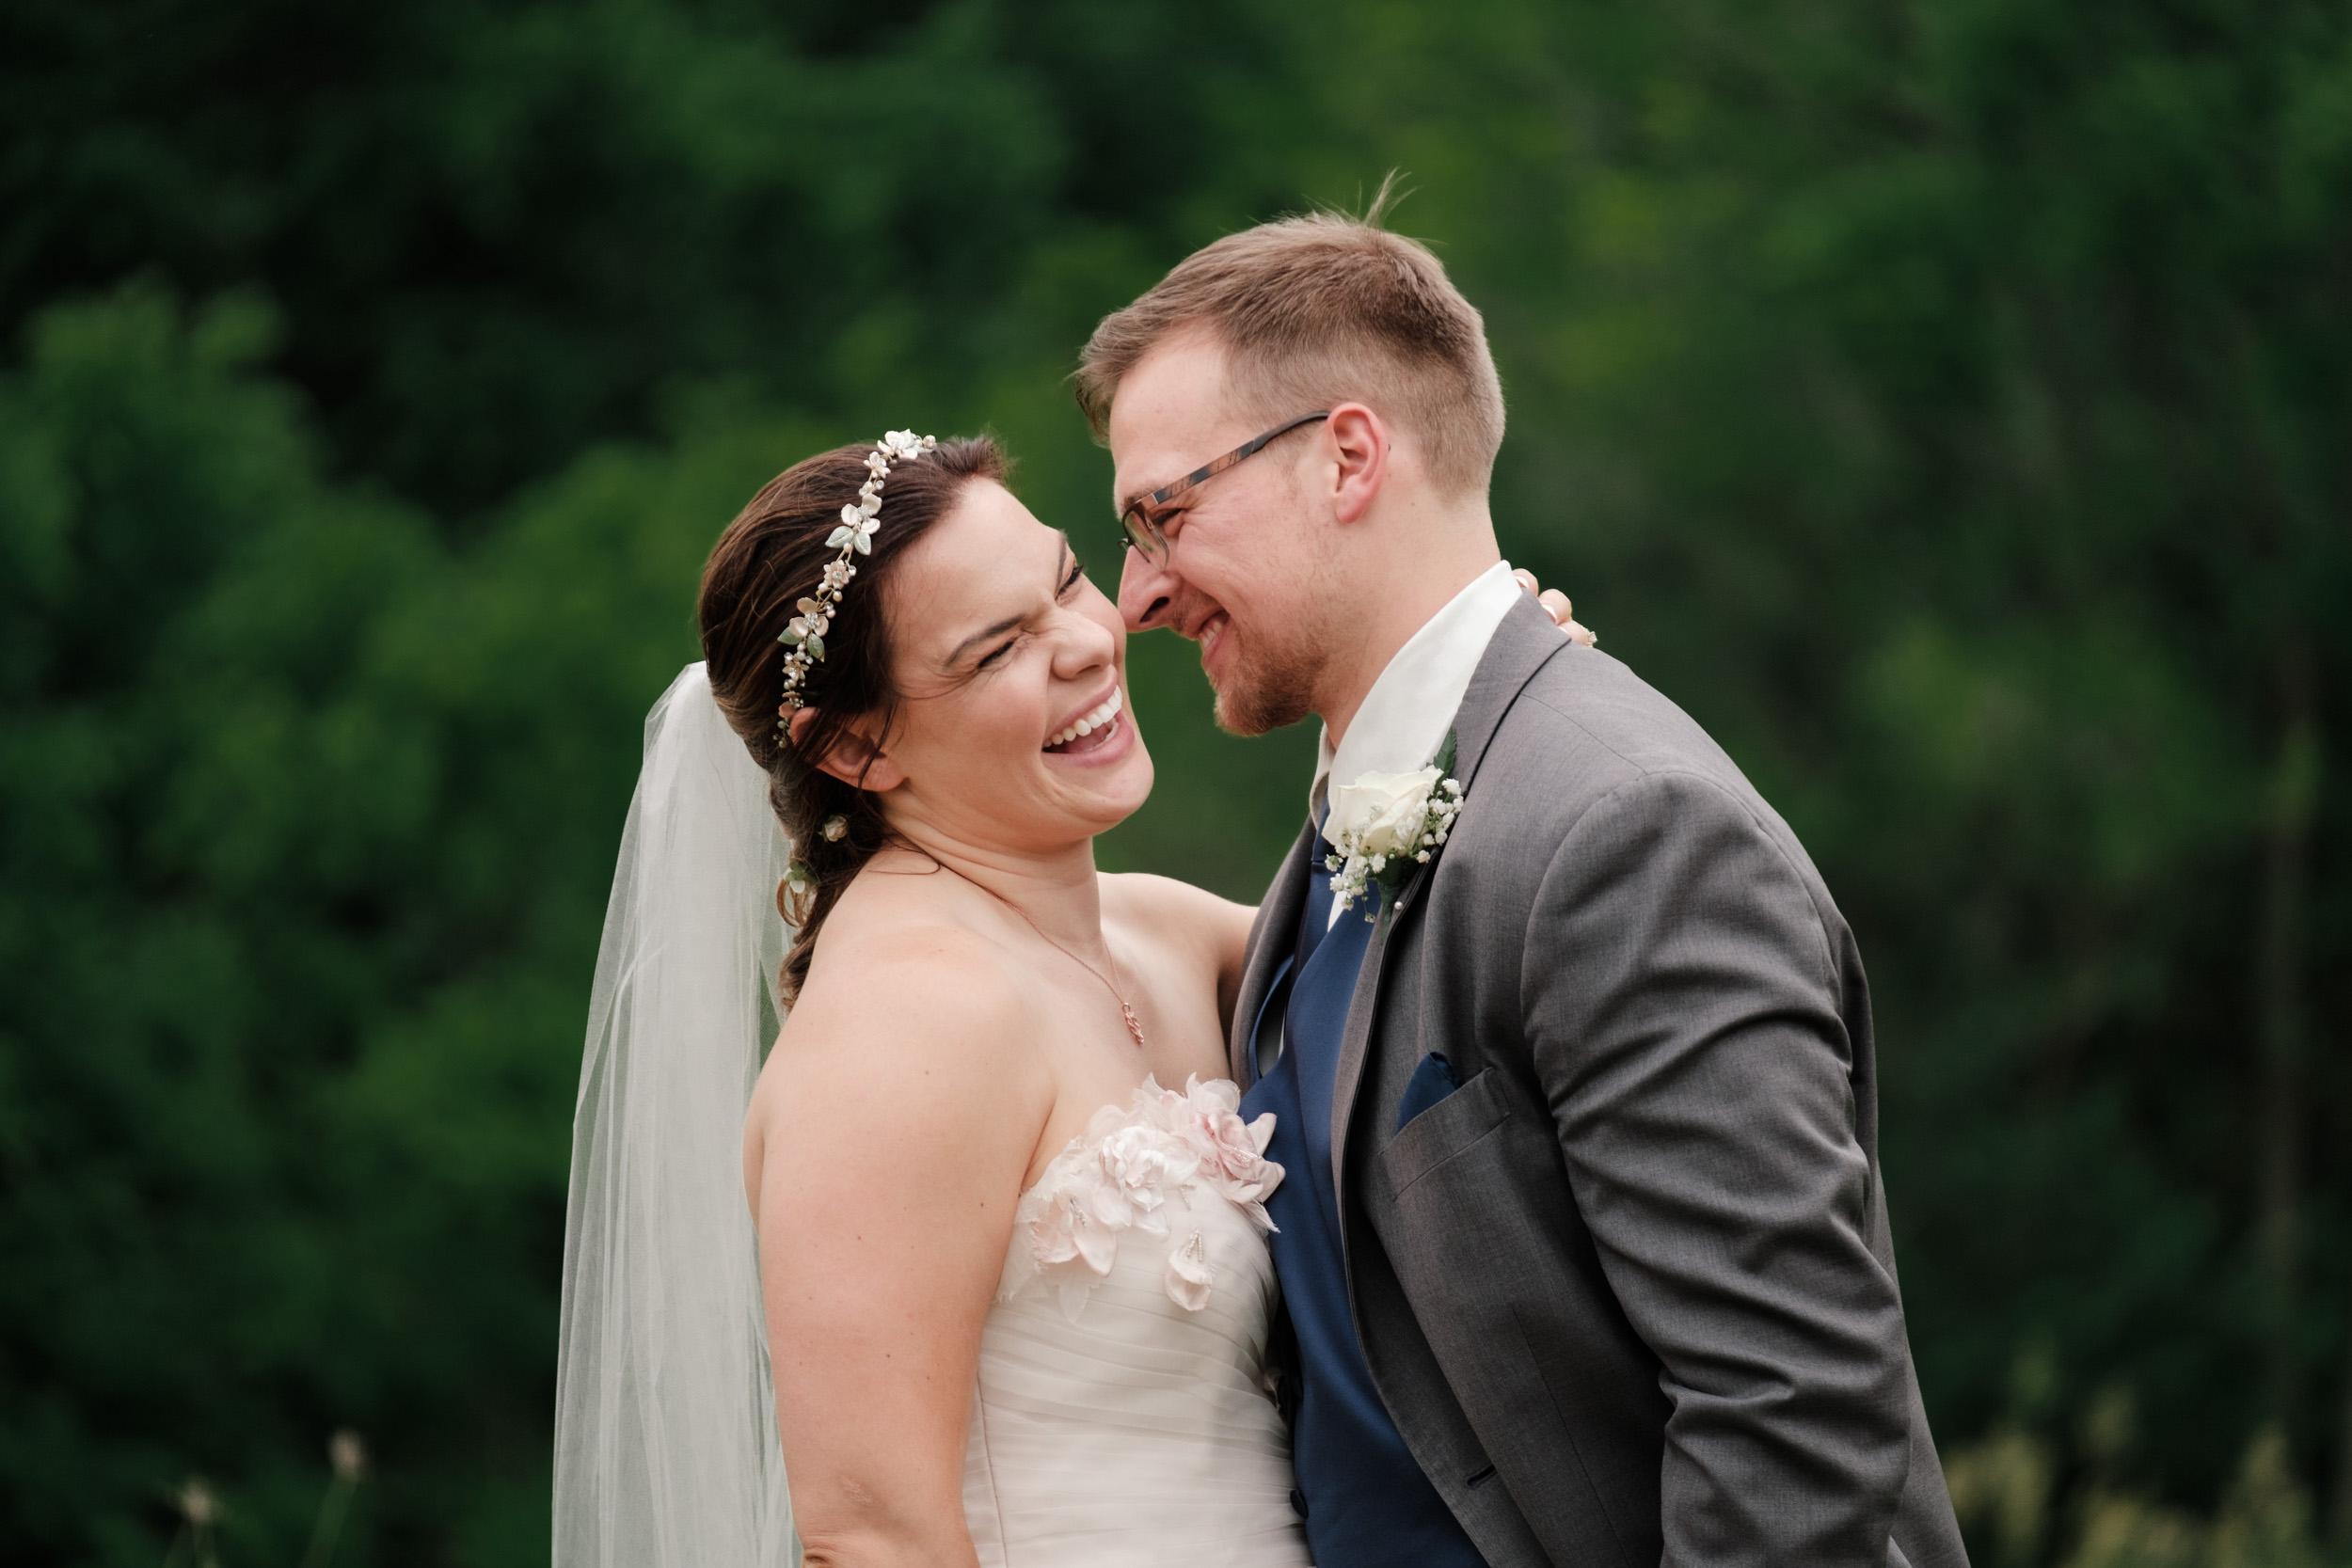 19-06-22-Ryan-Katie-The-Fields-Reserve-Wedding-50.jpg